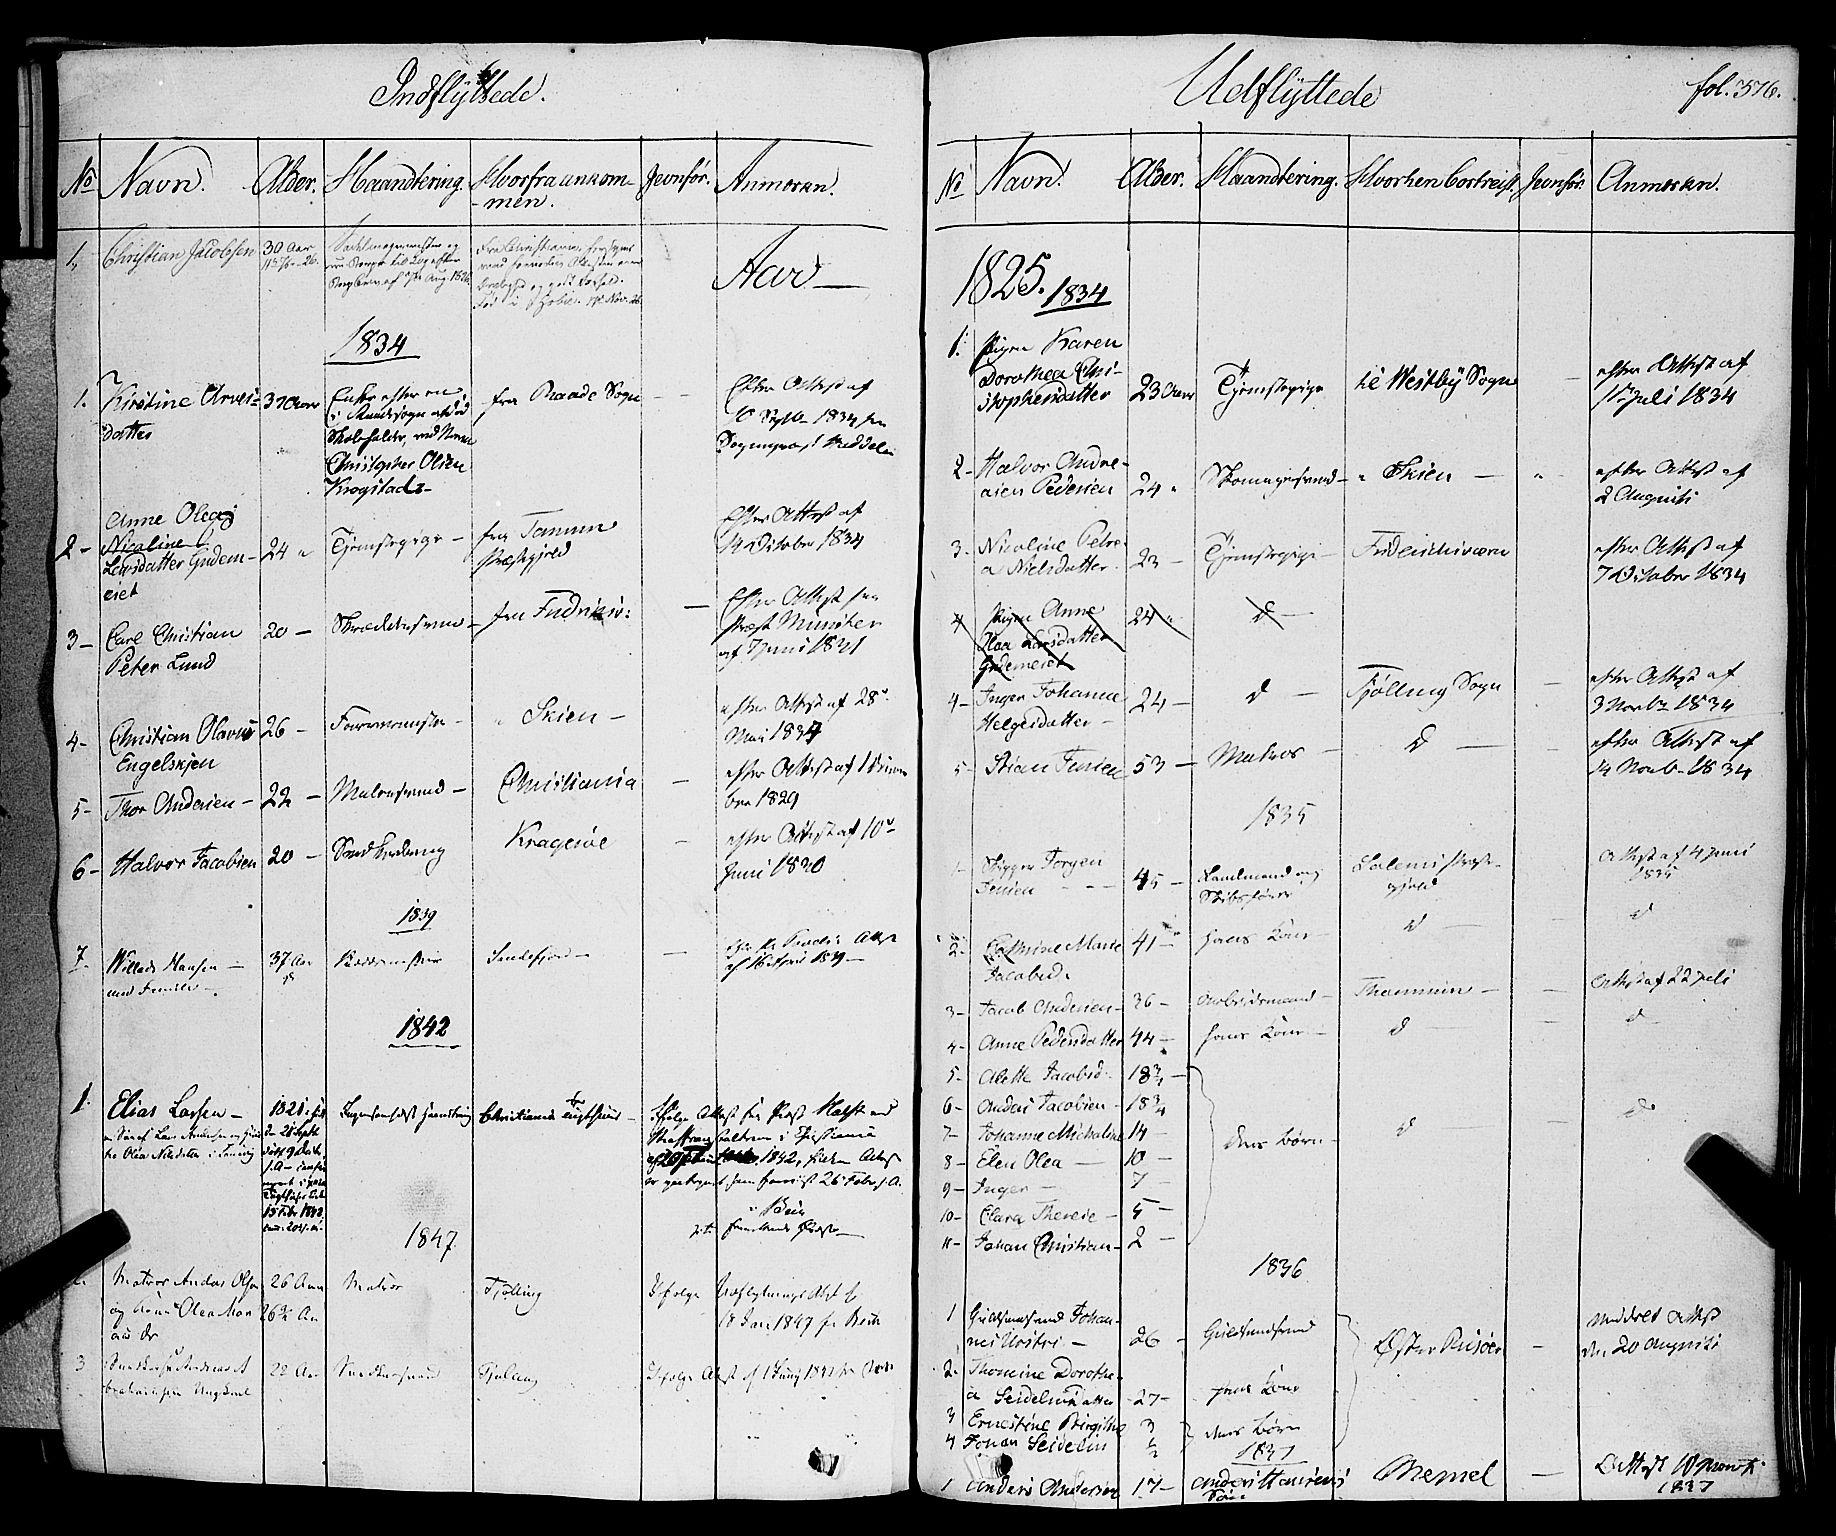 SAKO, Larvik kirkebøker, F/Fa/L0002: Ministerialbok nr. I 2, 1825-1847, s. 376